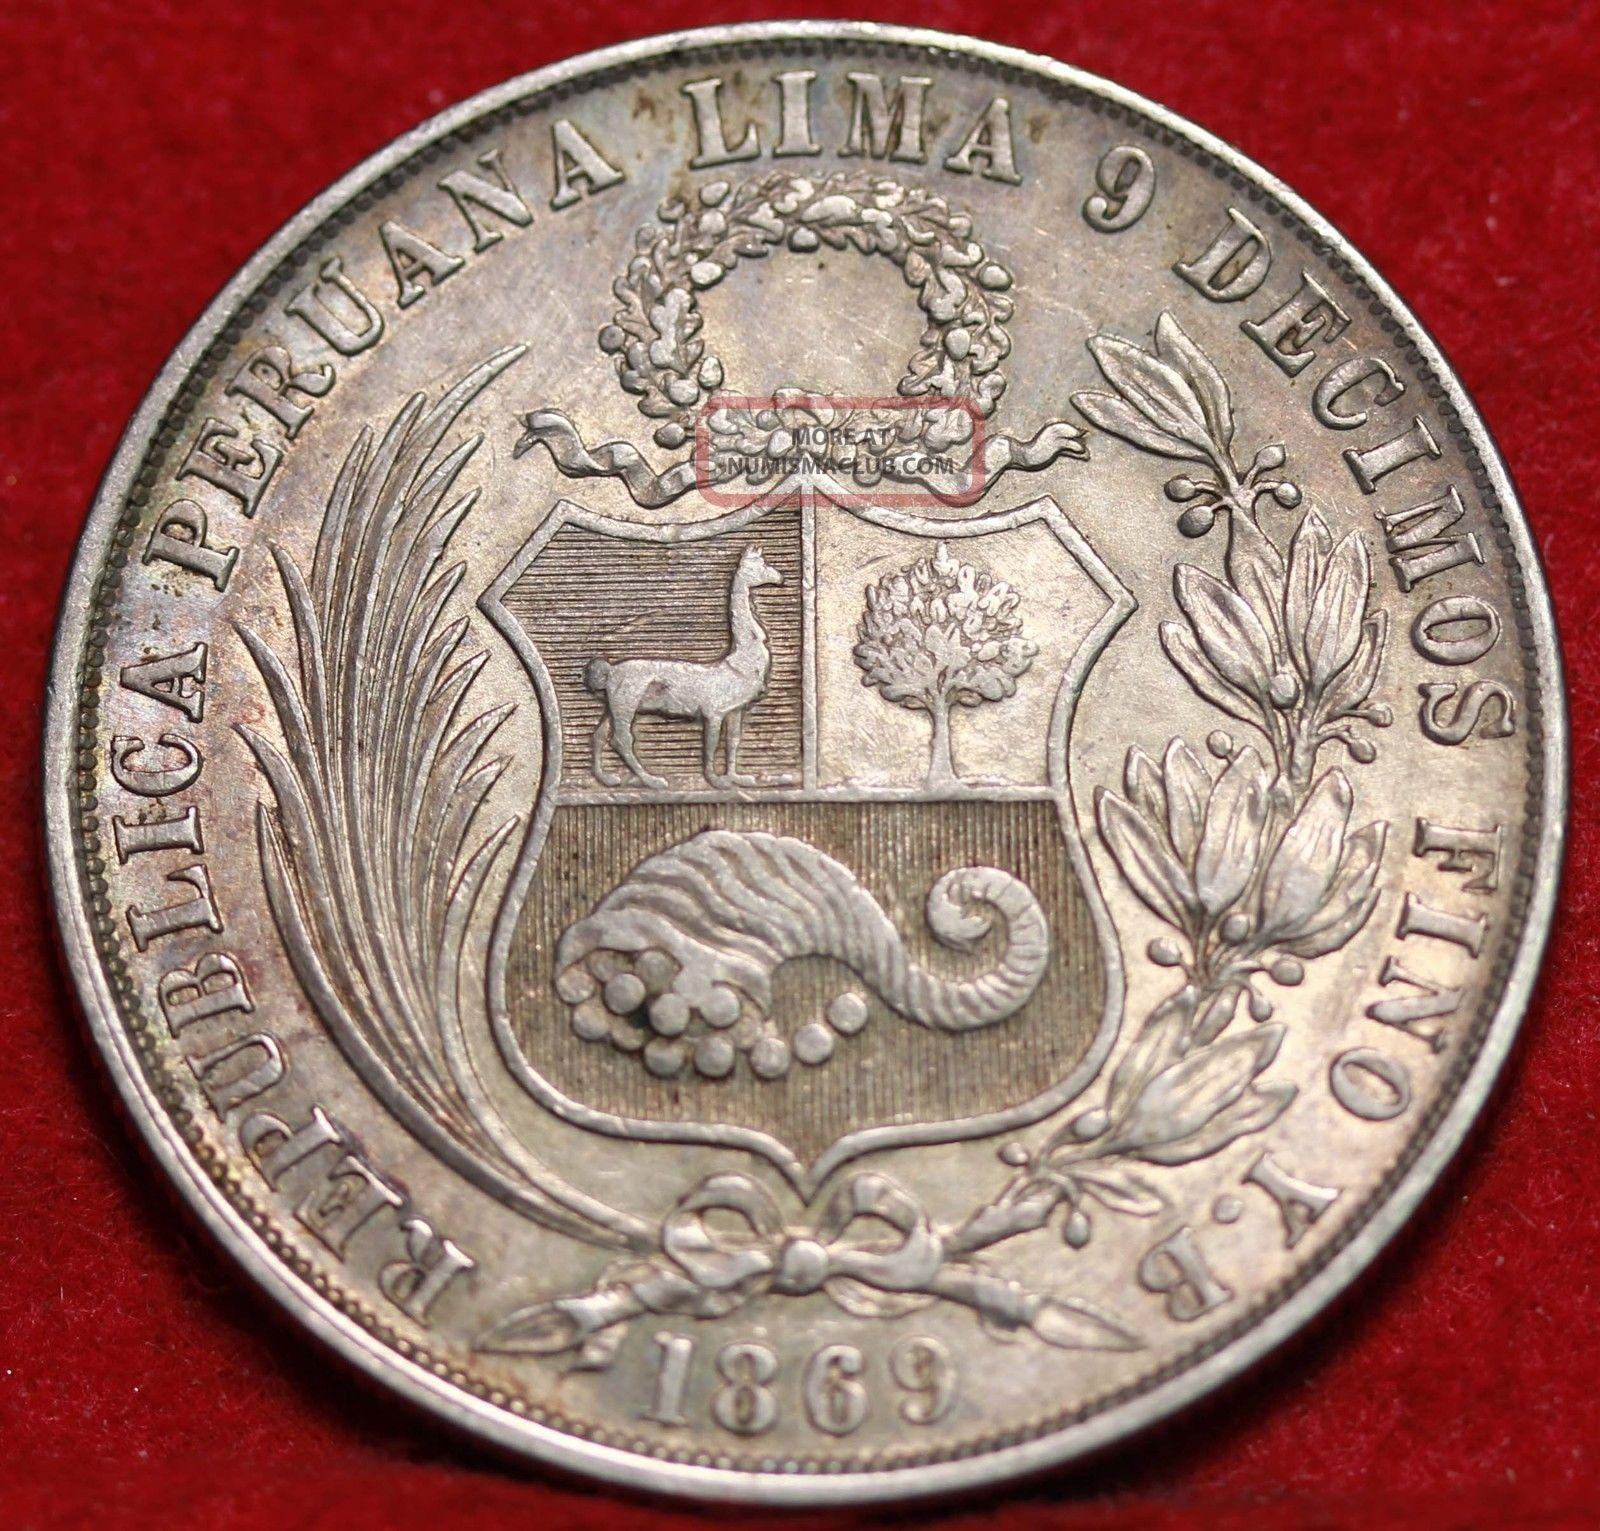 1869 Peru Un Sol Foreign Coin S H